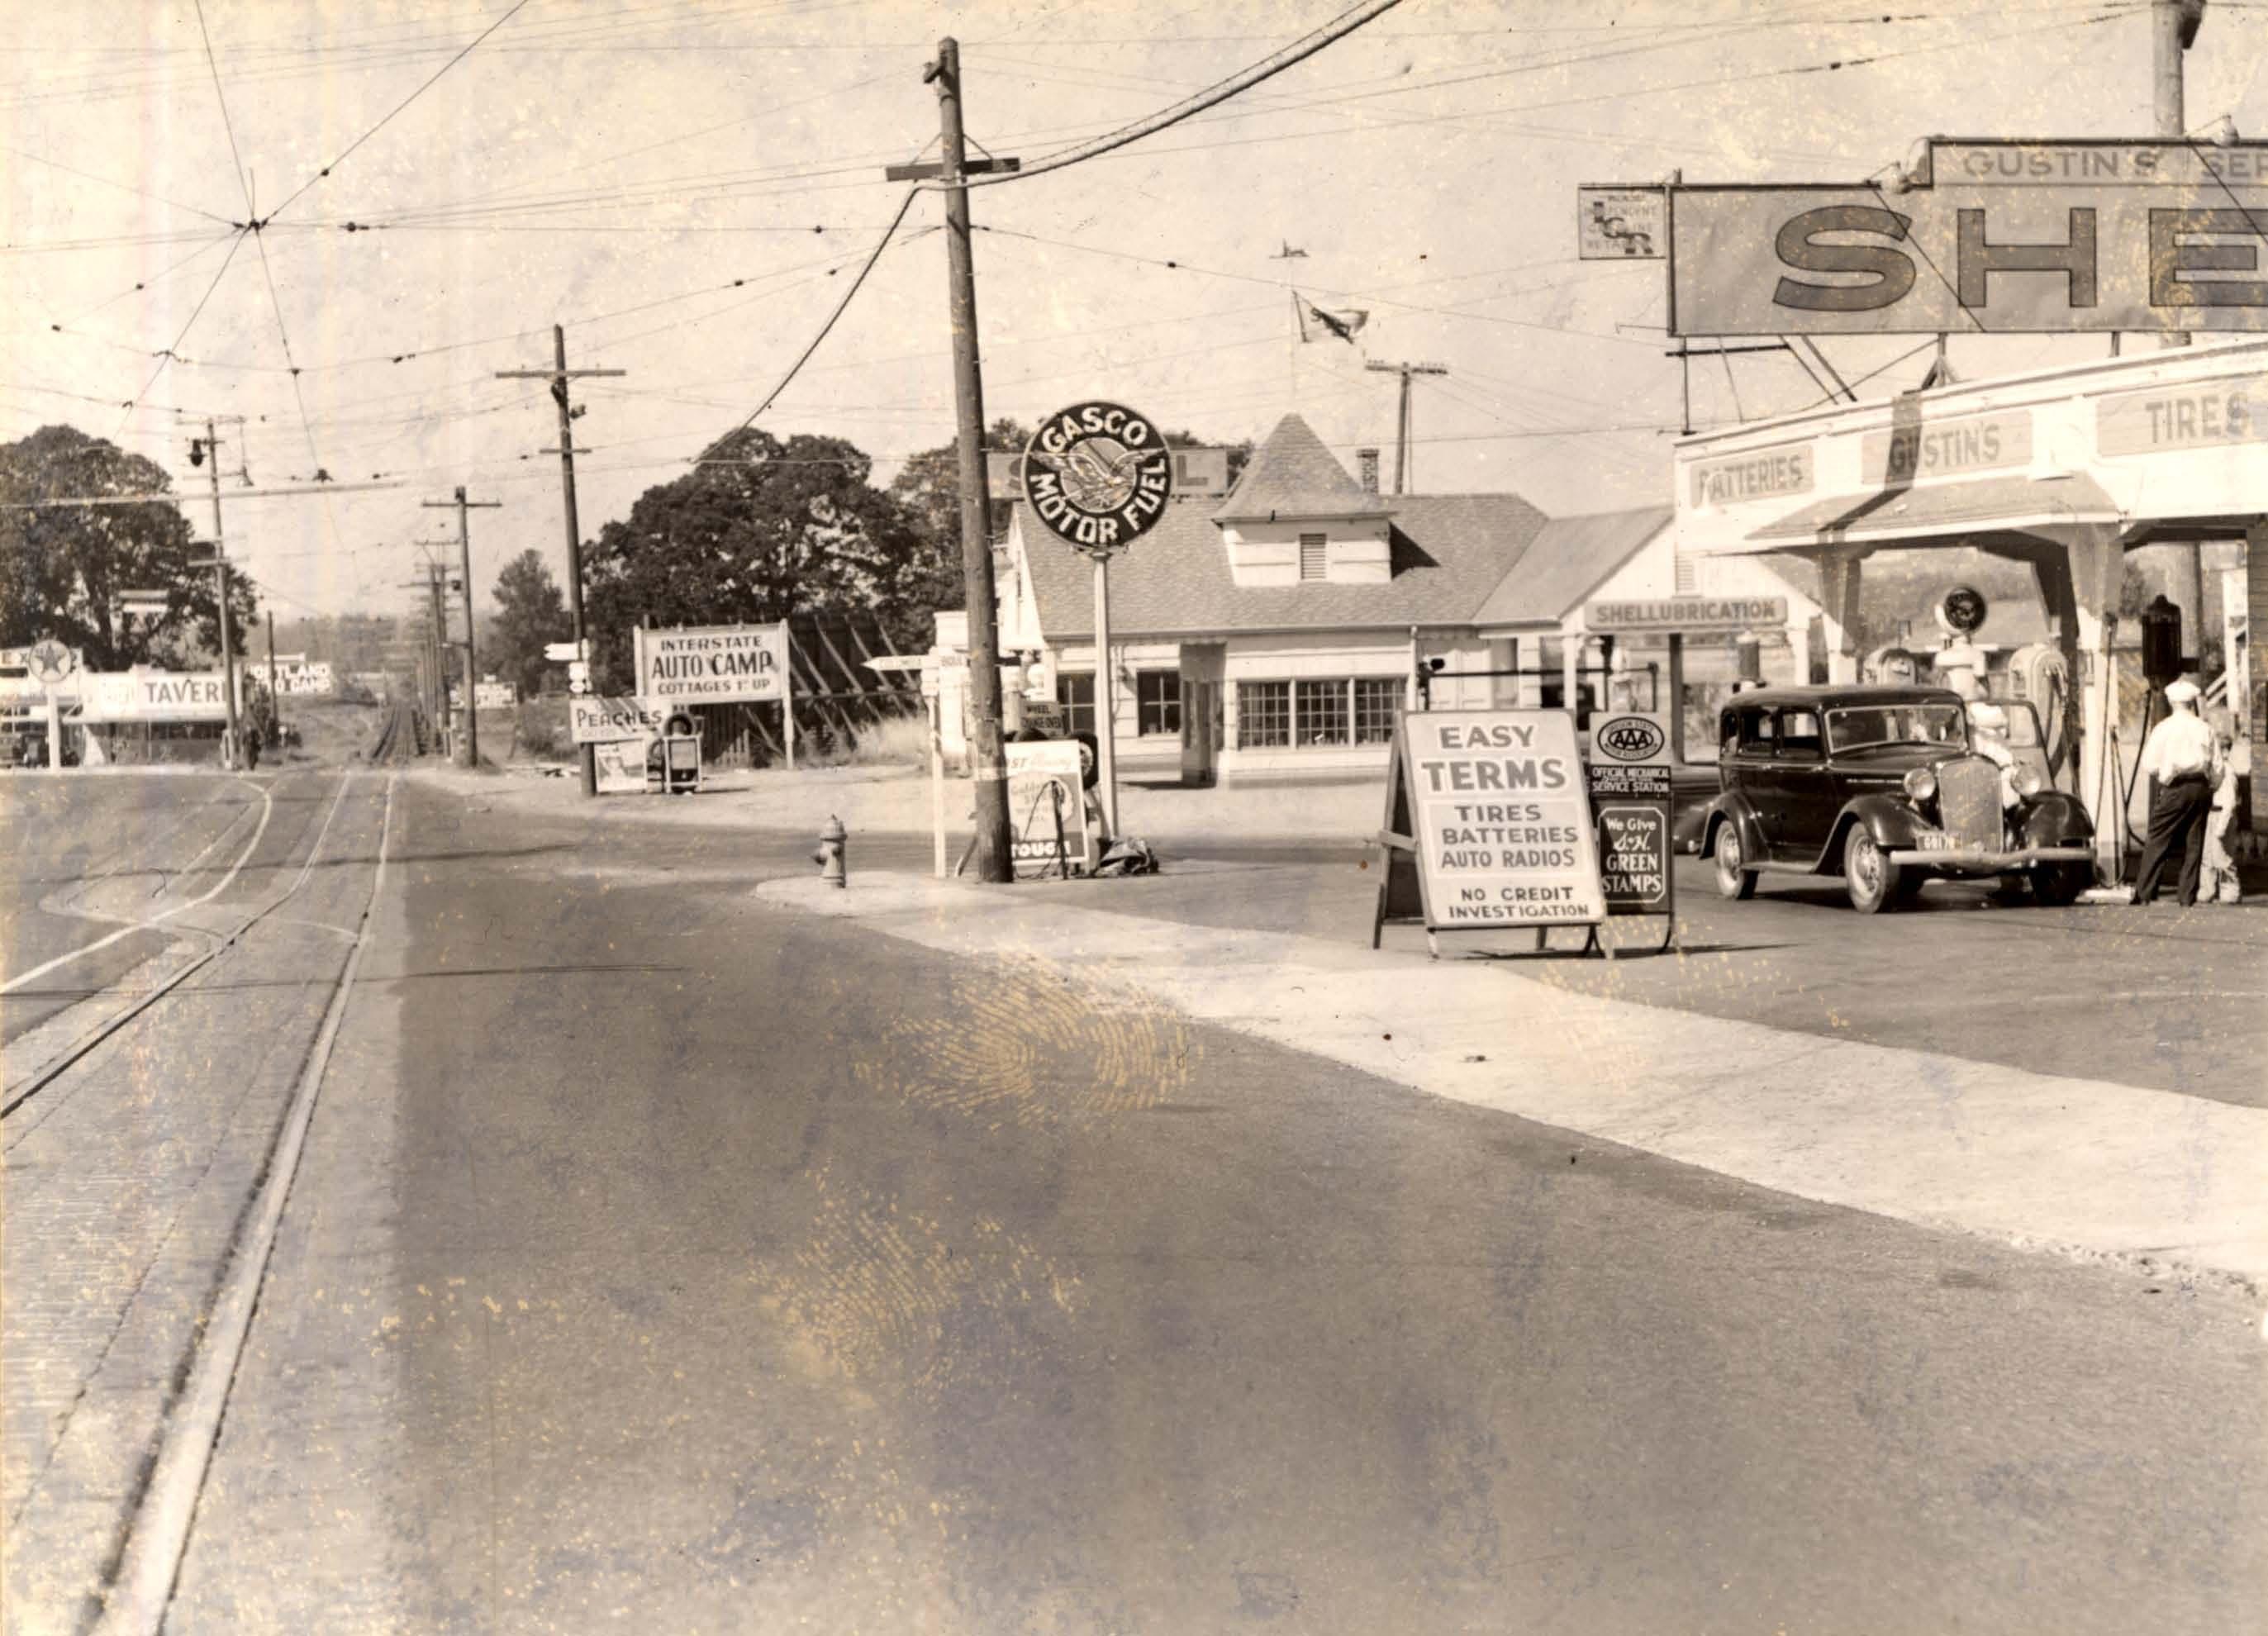 Ne union columbia 1937 vintage portland for Motor city credit union locations